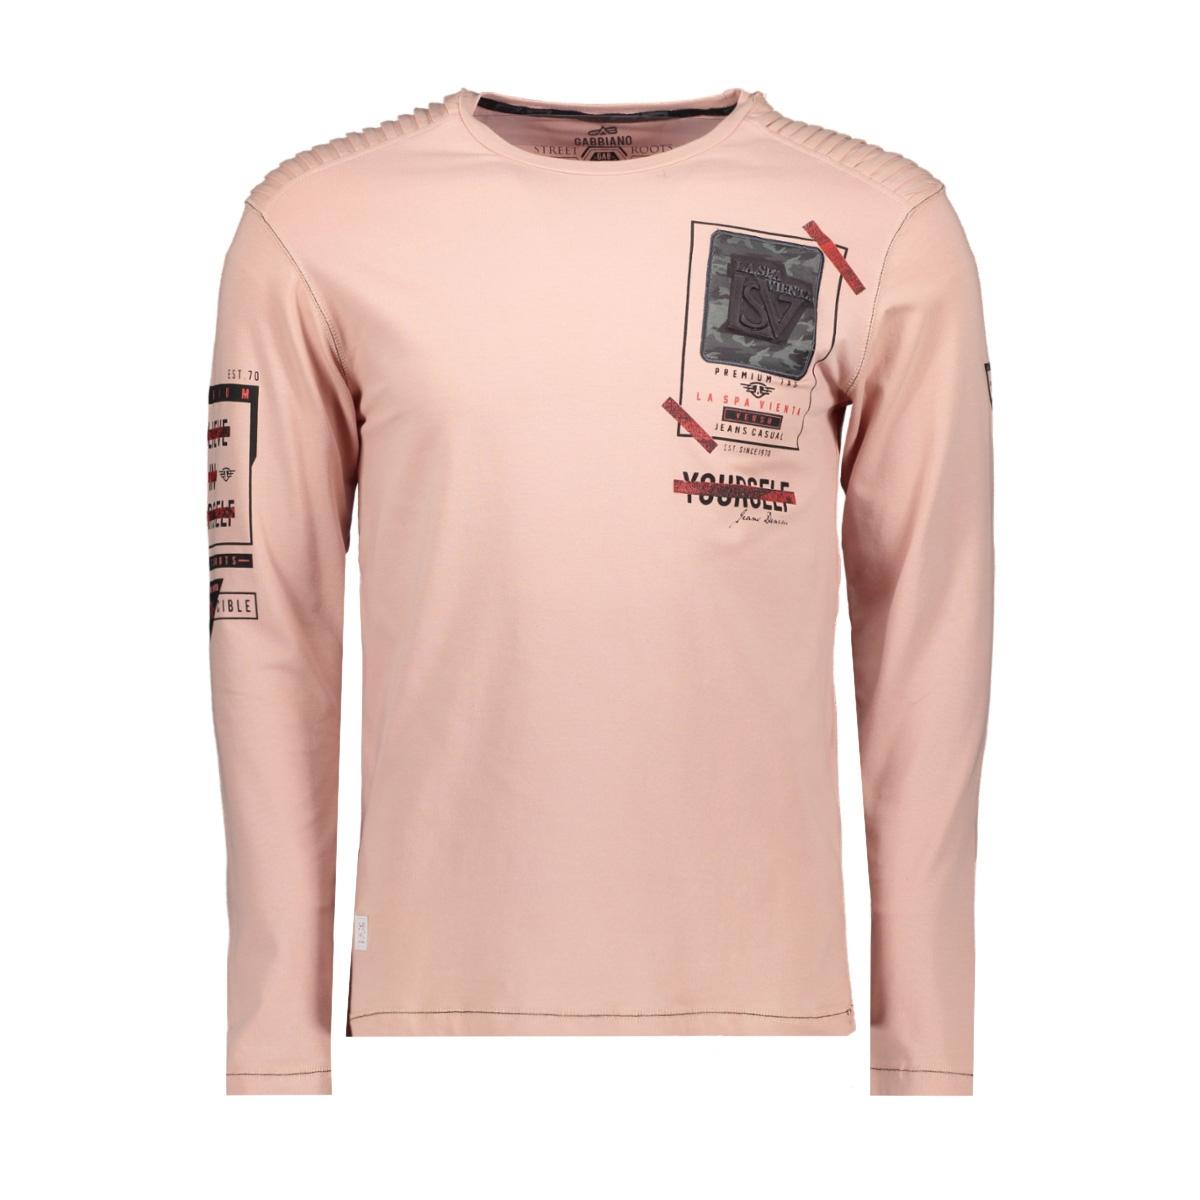 gabbiano t shirt 13857 gabbiano t-shirt pink